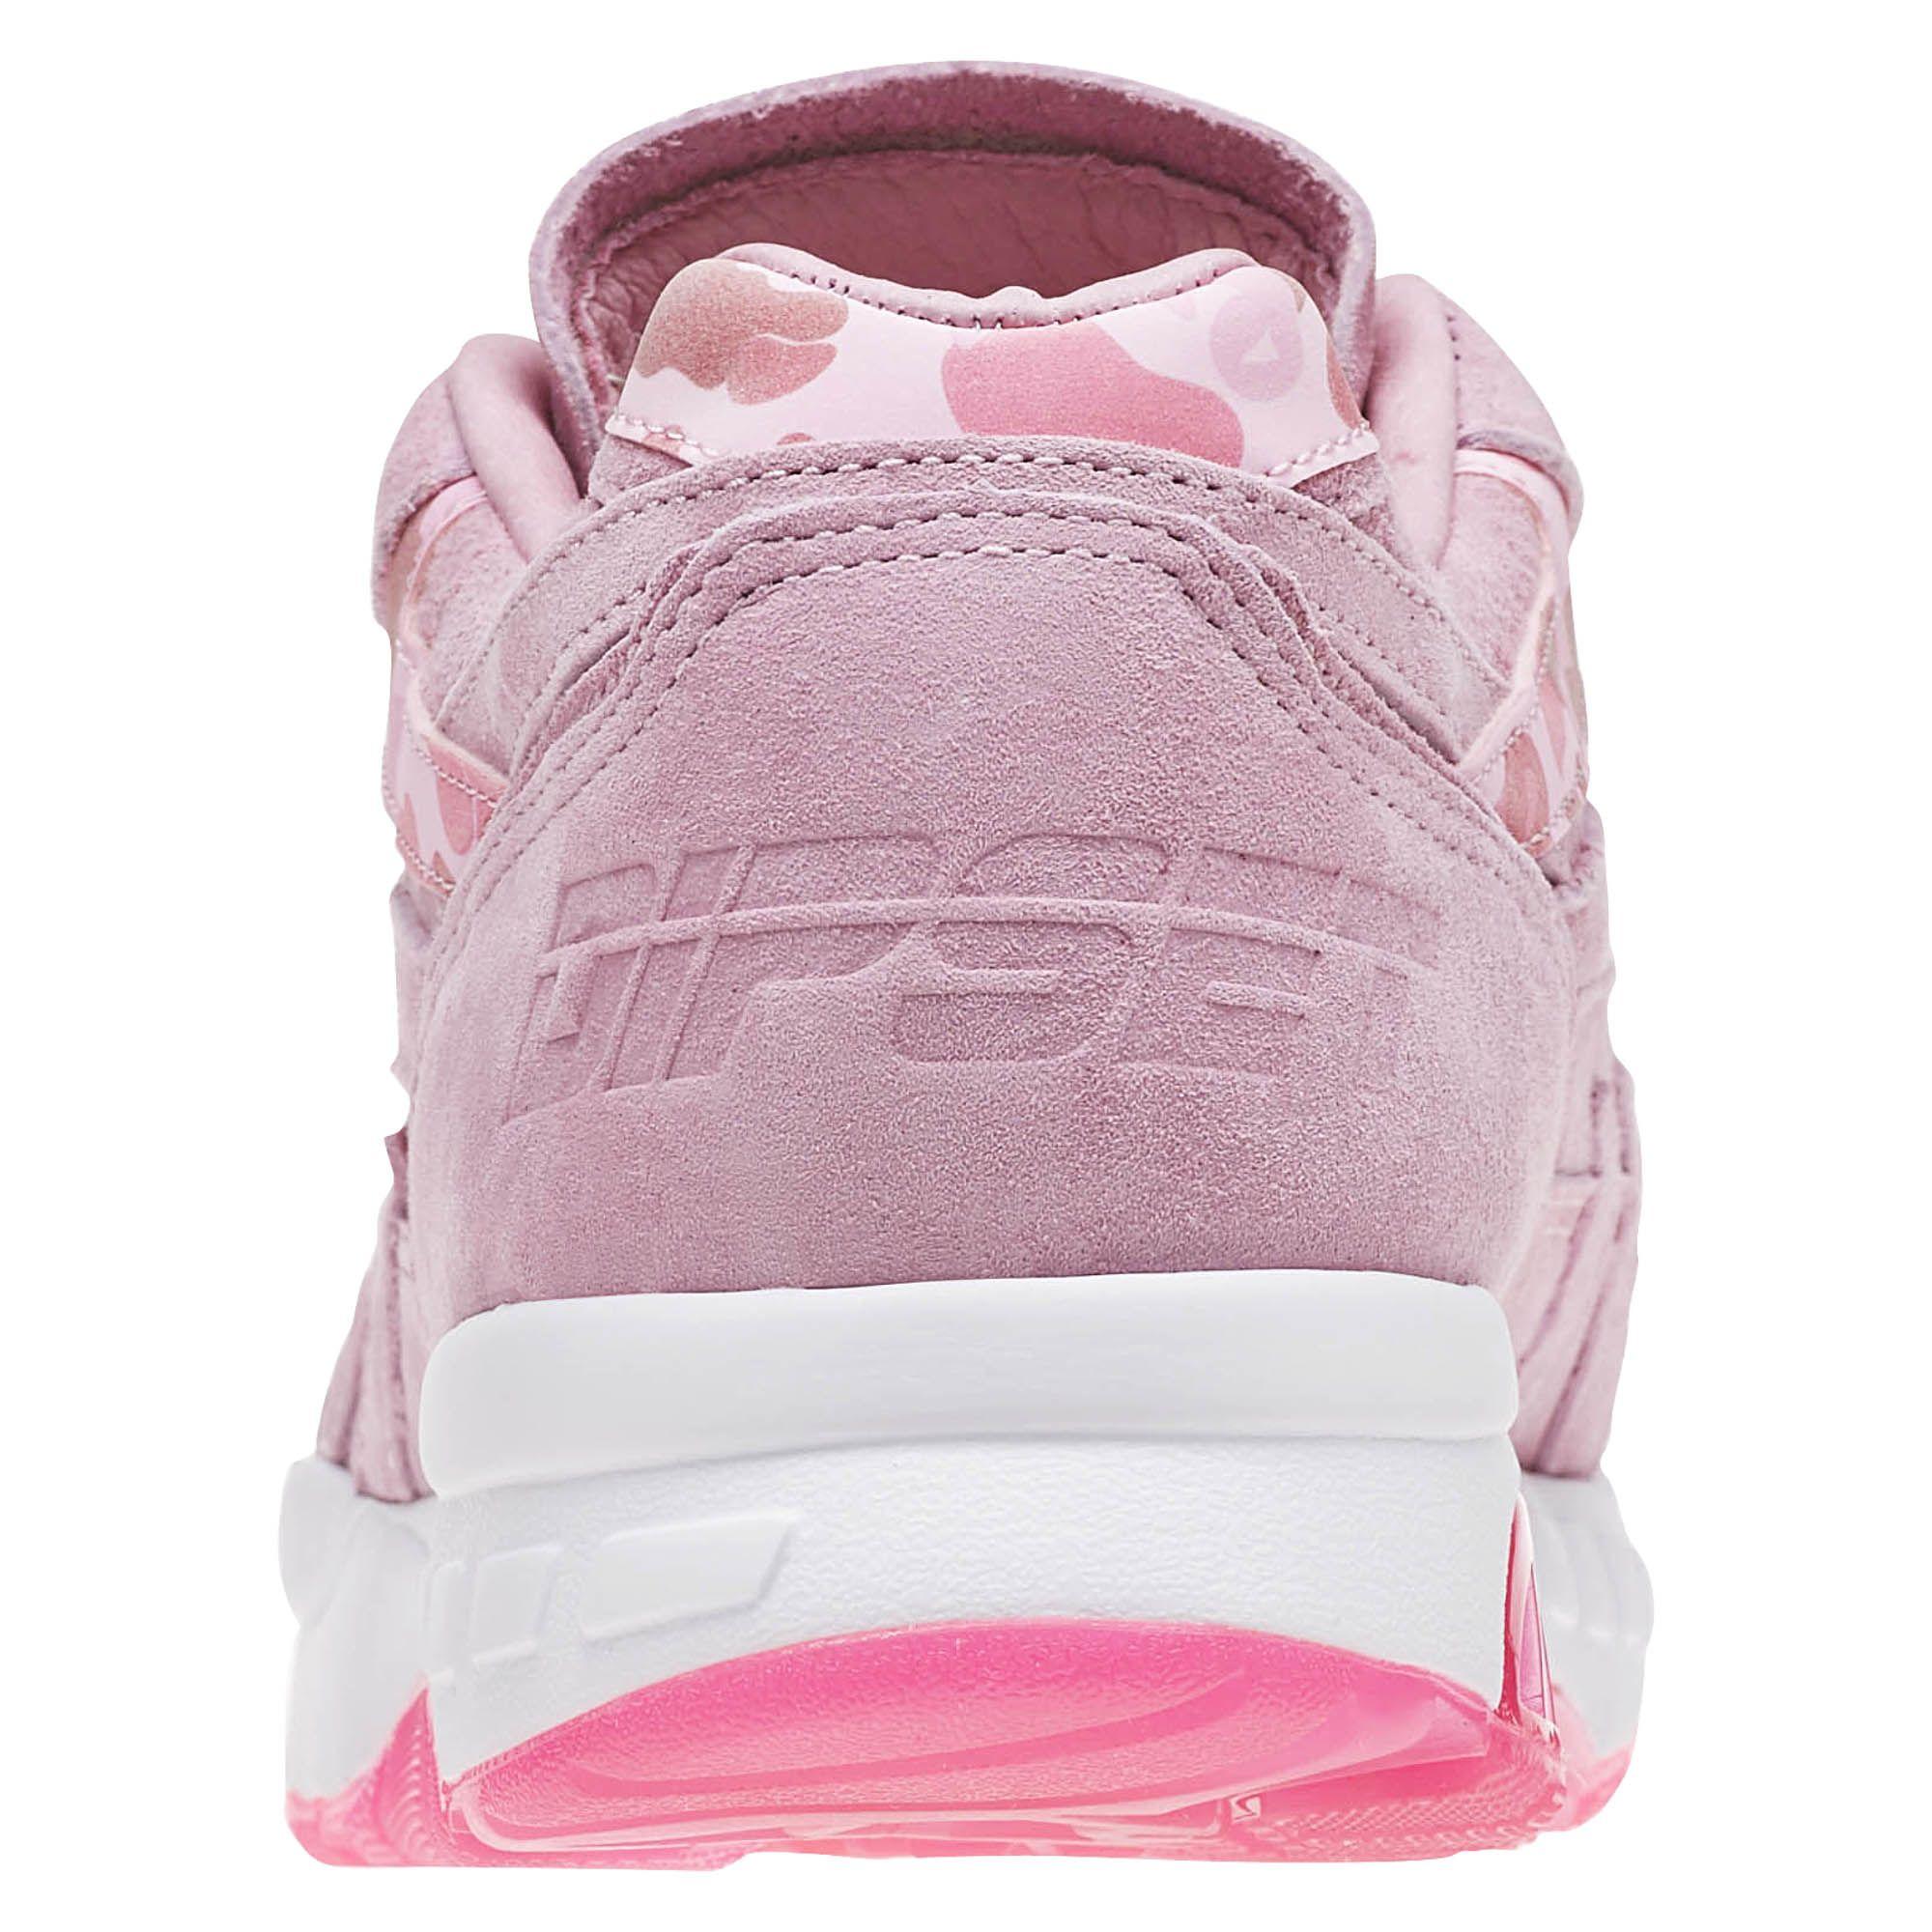 Cam ron Reebok Ventilator Killa Pink Dipset Fleebok 2 Release Date ... c9c00b349